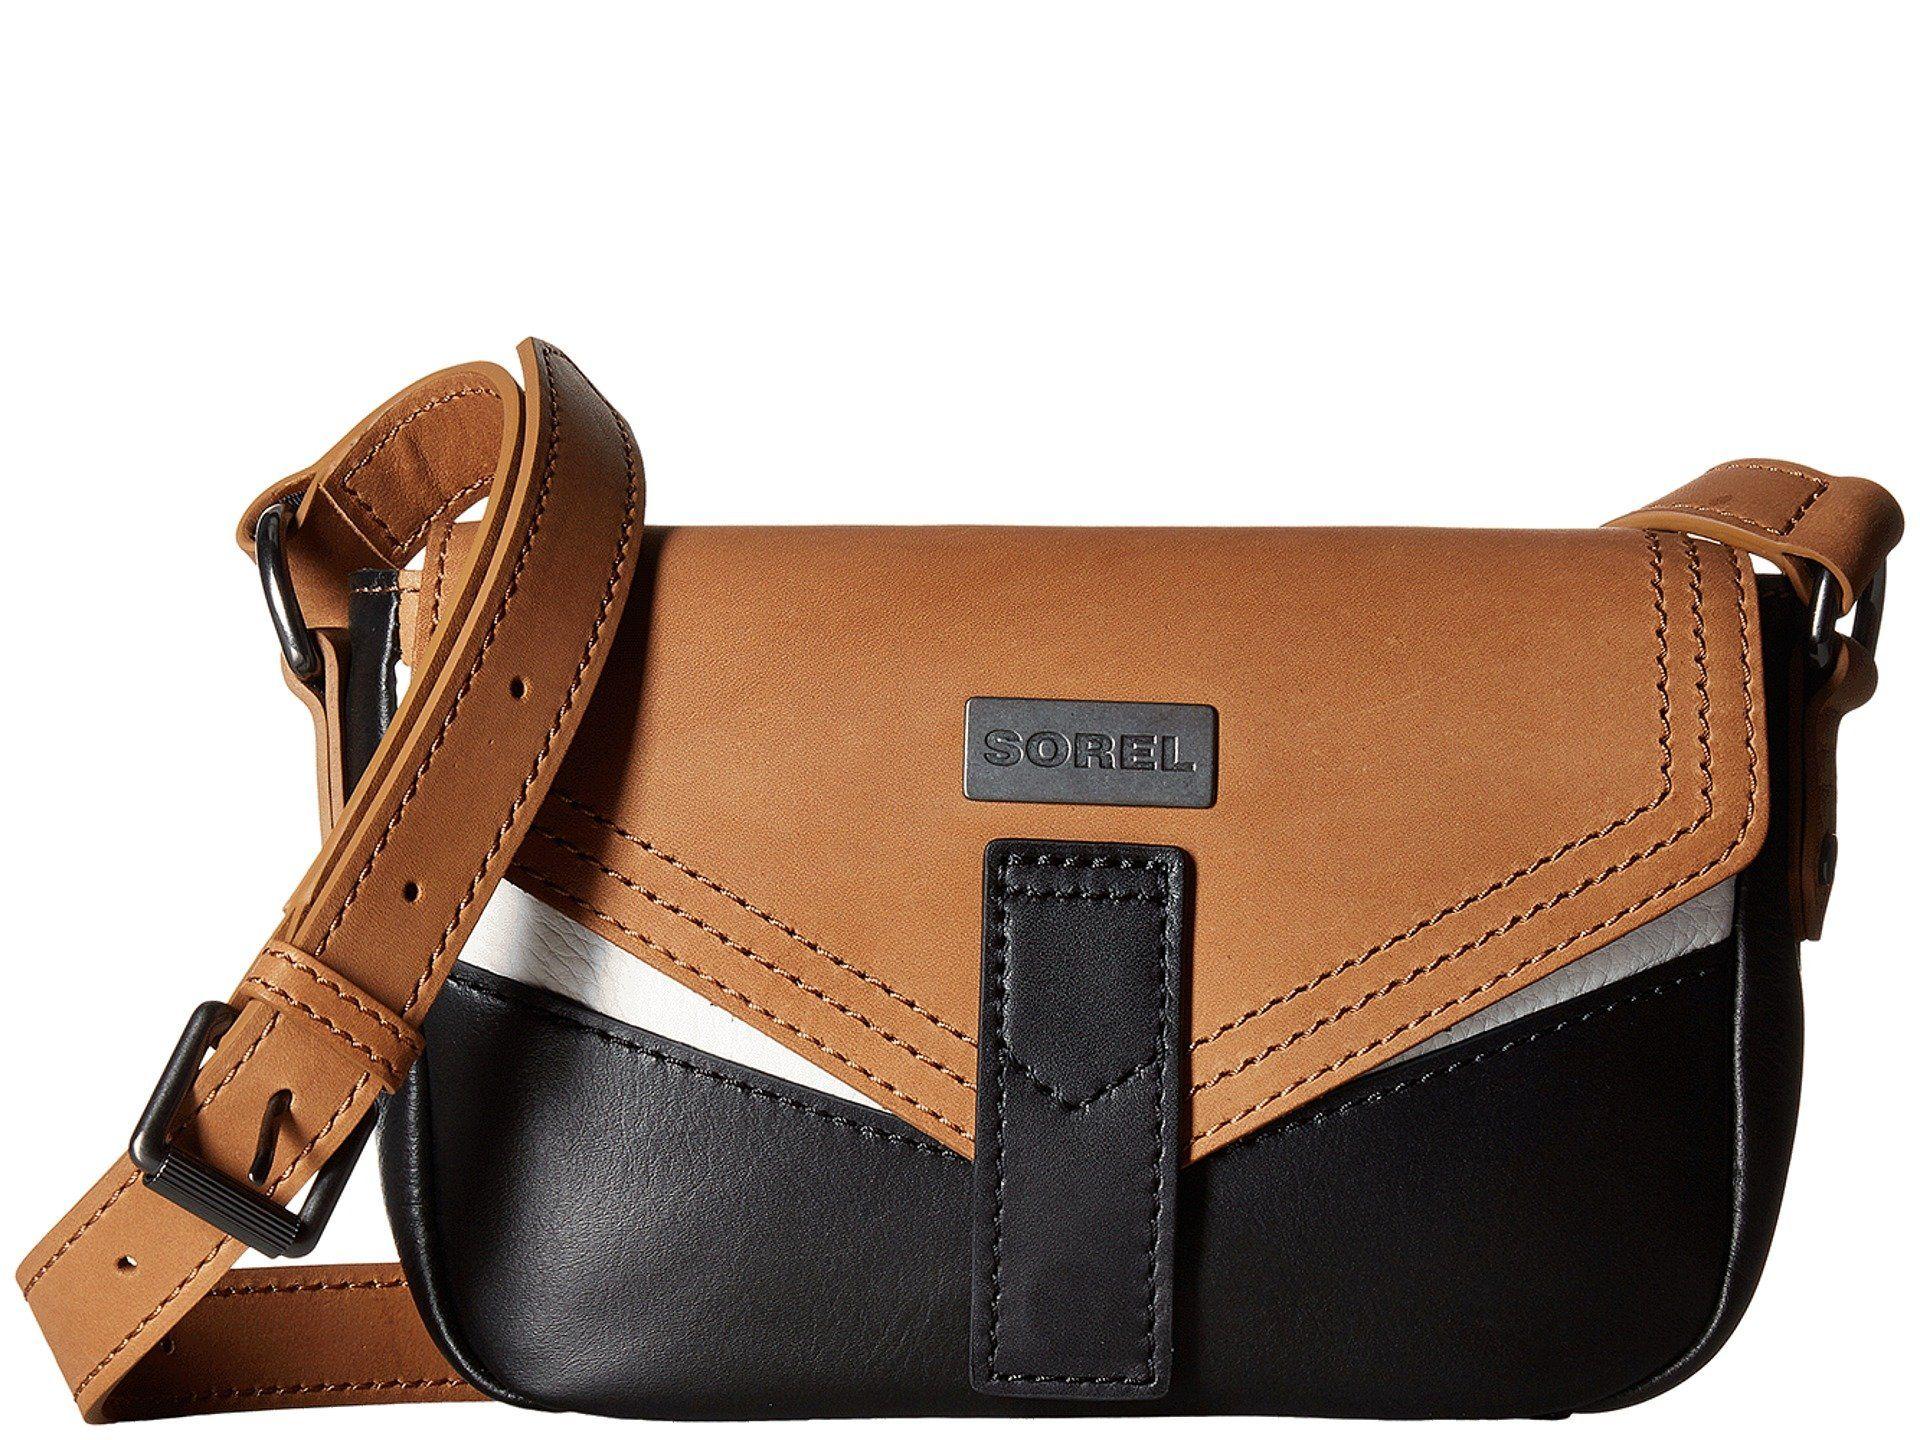 922235ee76 SOREL Small Crossbody.  sorel  bags  shoulder bags  leather  nylon   crossbody  lining